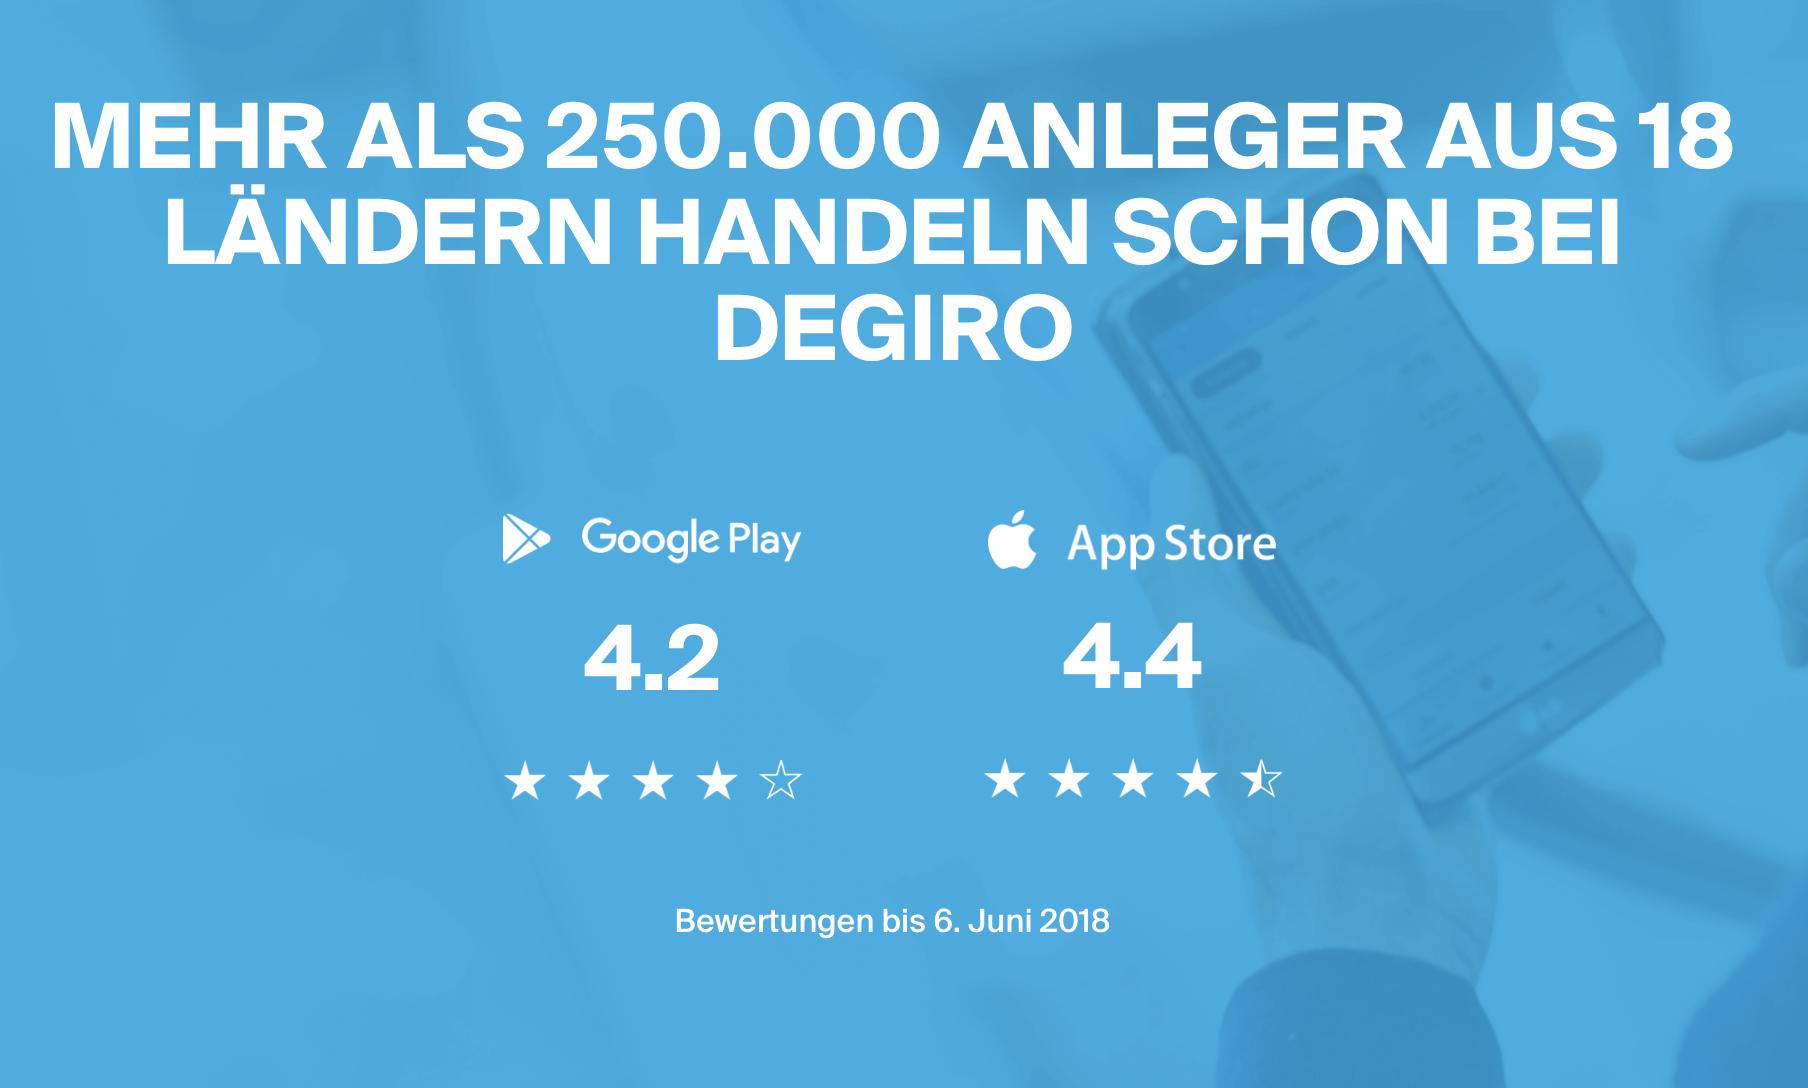 Bereits mehr als 250.000 Anleger aus 18 verschiedenen Ländern handeln bei dem Online-Broker DEGIRO